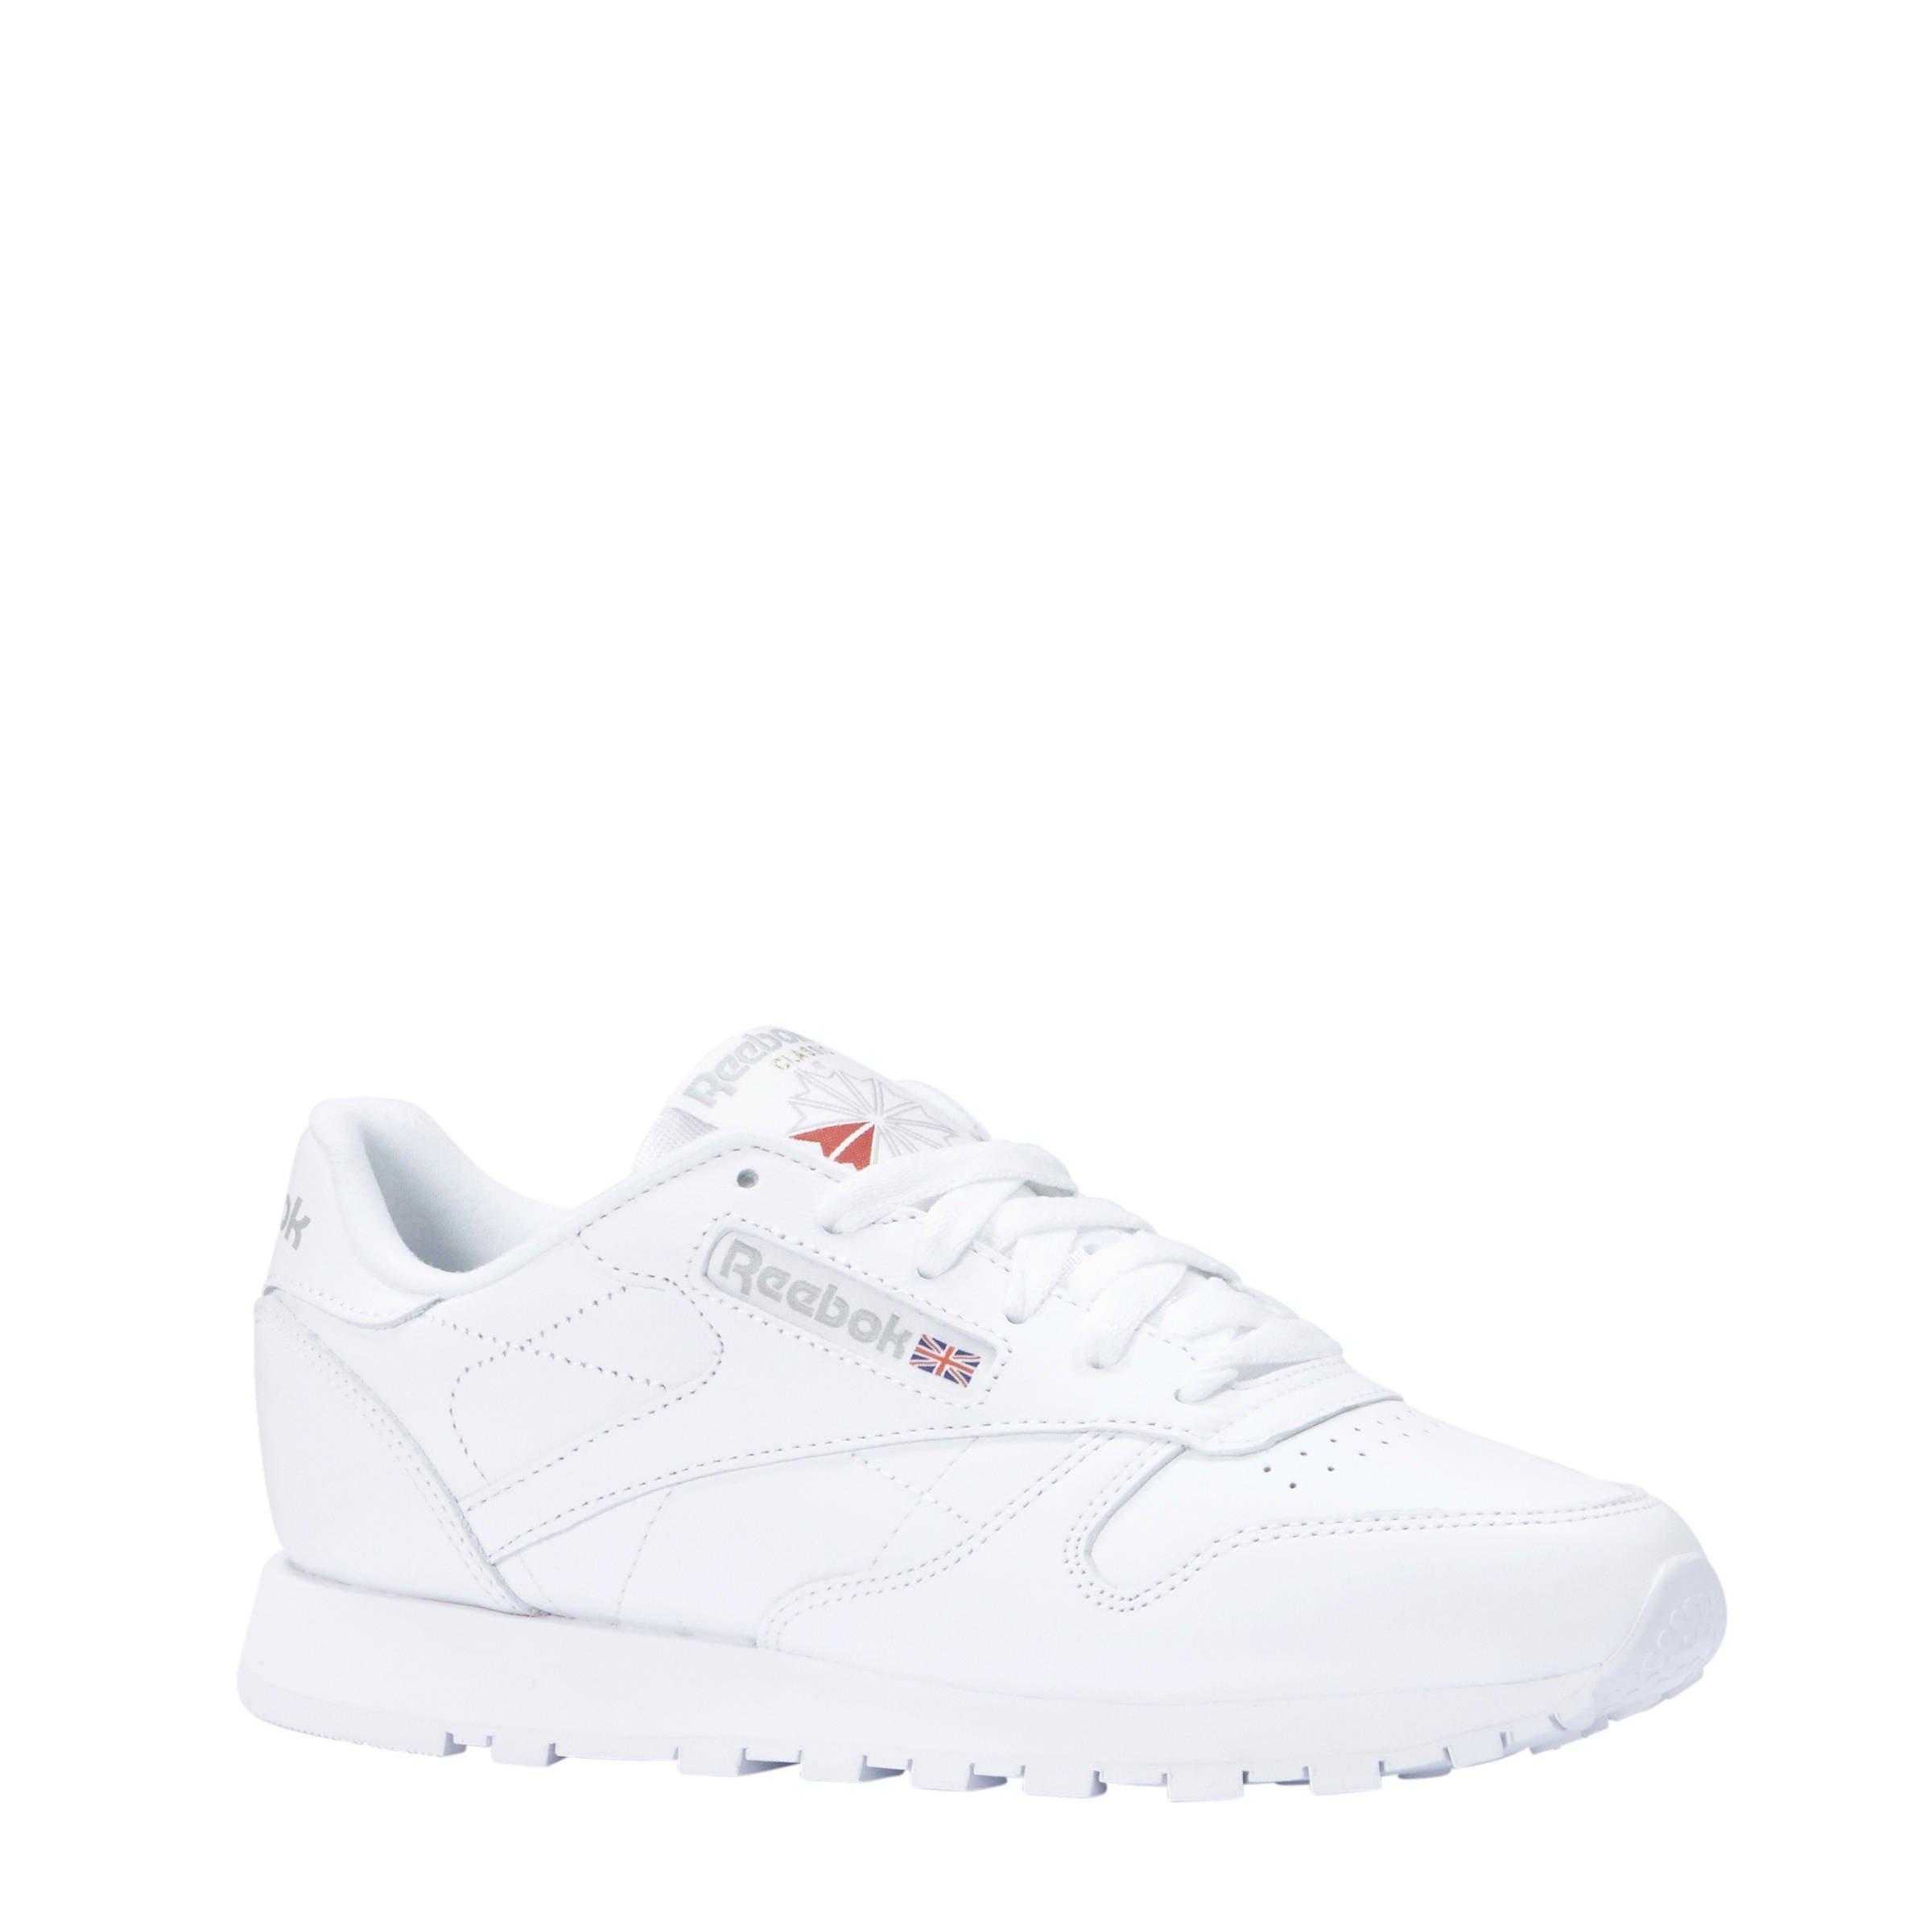 Witte Reebok Revenge | Dames & heren | Sneakerbaron NL